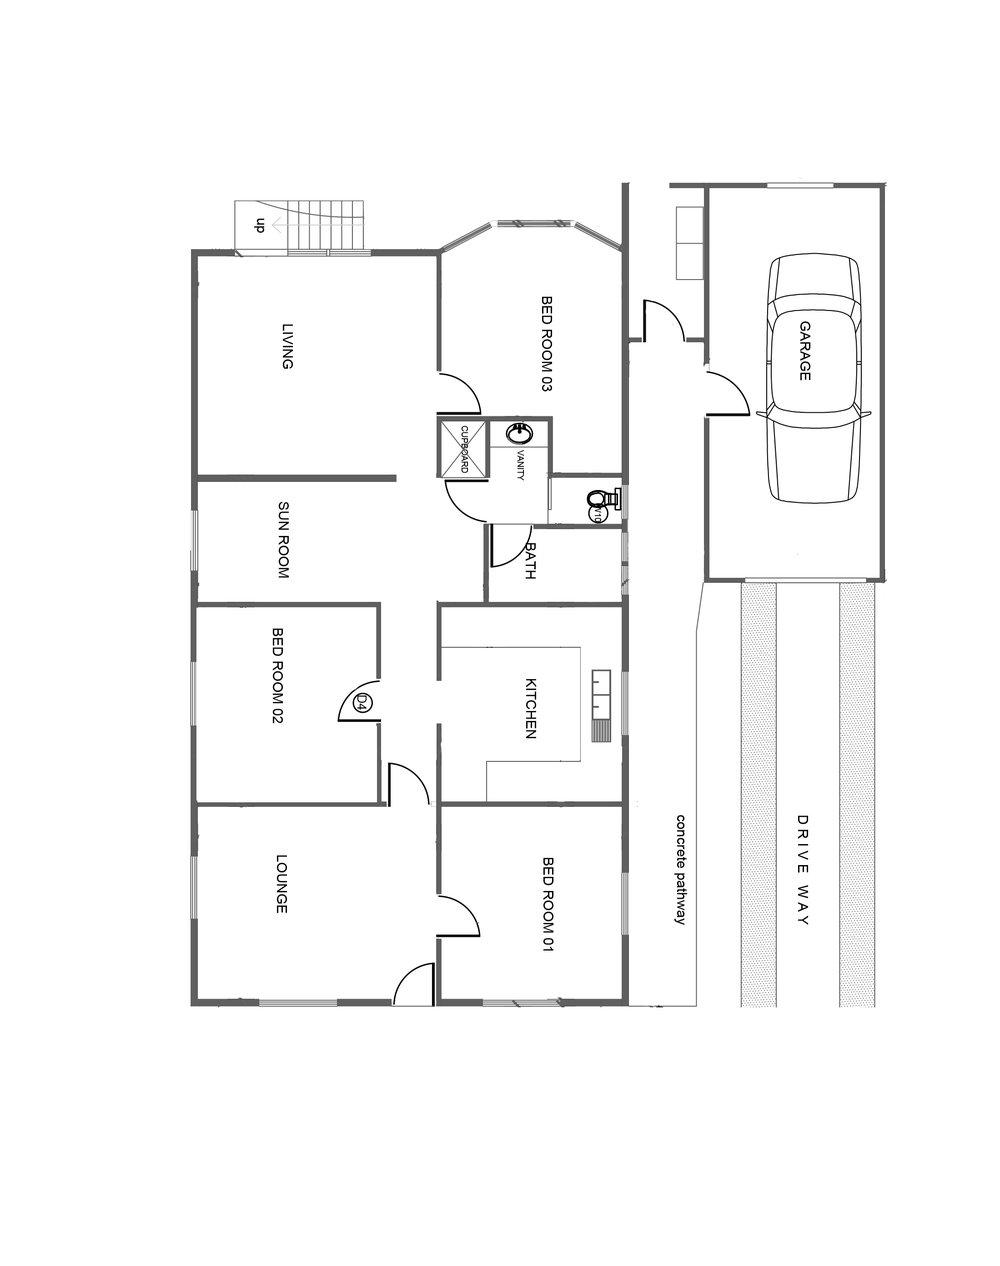 HOUSE-5-BEFORE.jpg